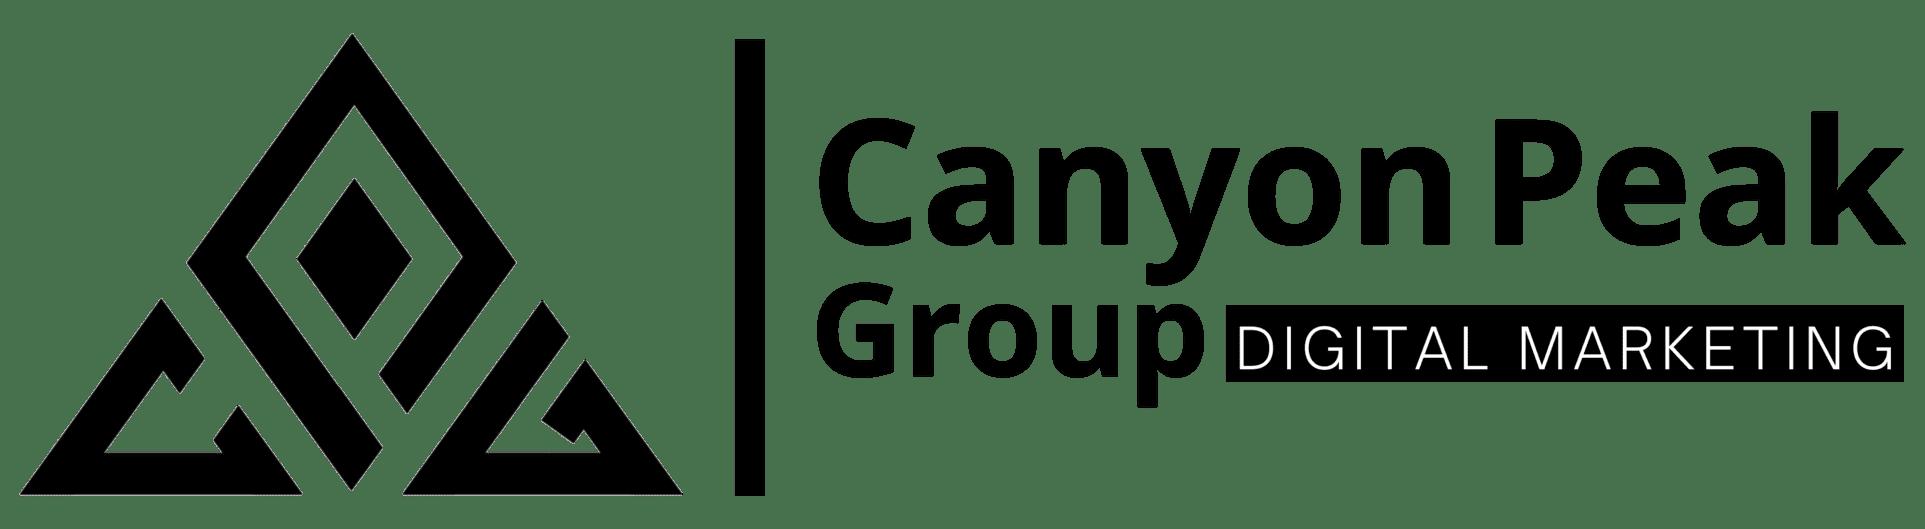 Canyon Peak Group